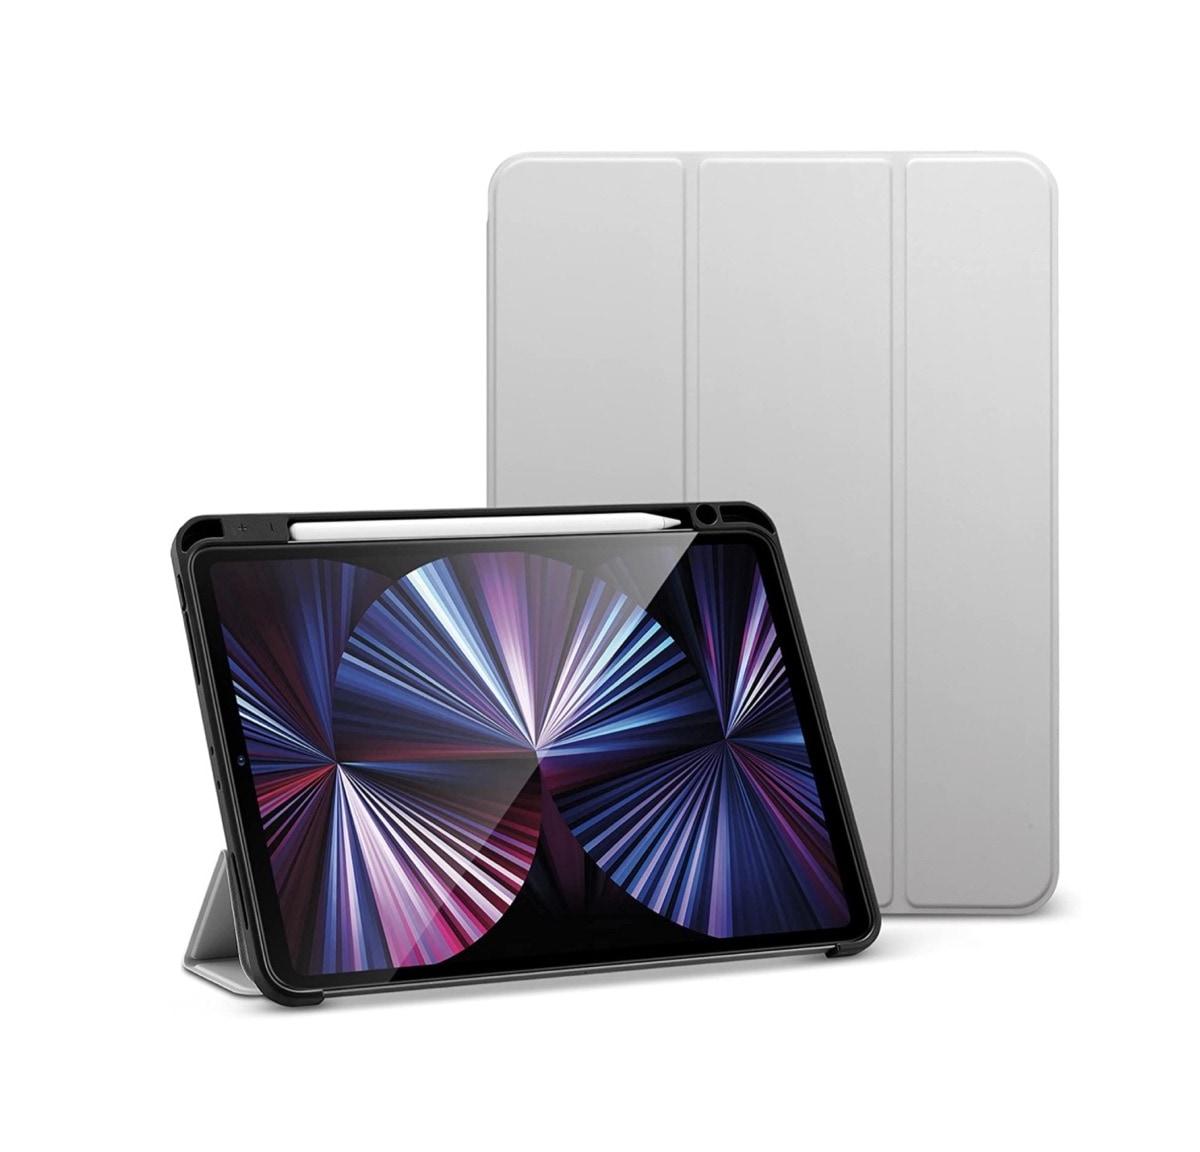 ESR Rebound iPad Pro 11 2021 tri-fold stand case